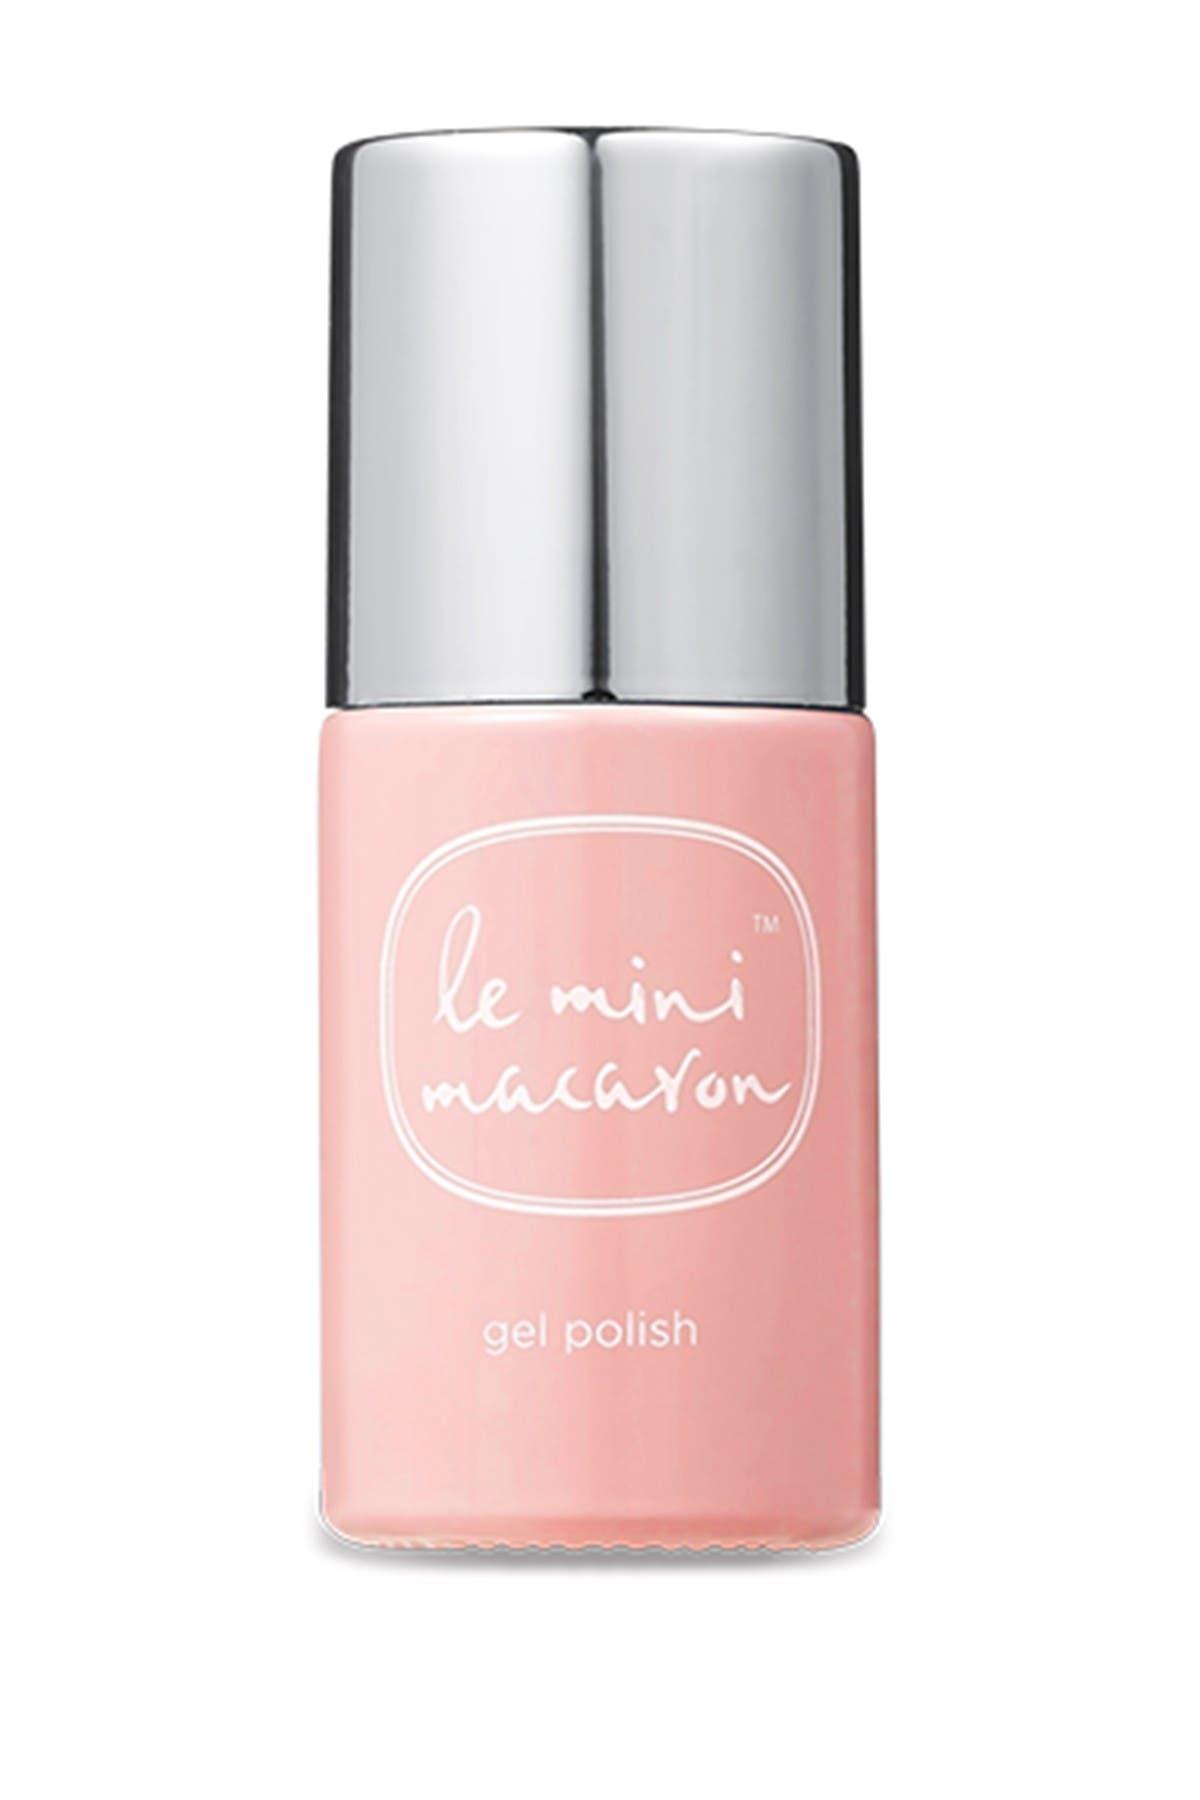 Image of LE MINI MACARON Gel Nail Polish - Rose Creme